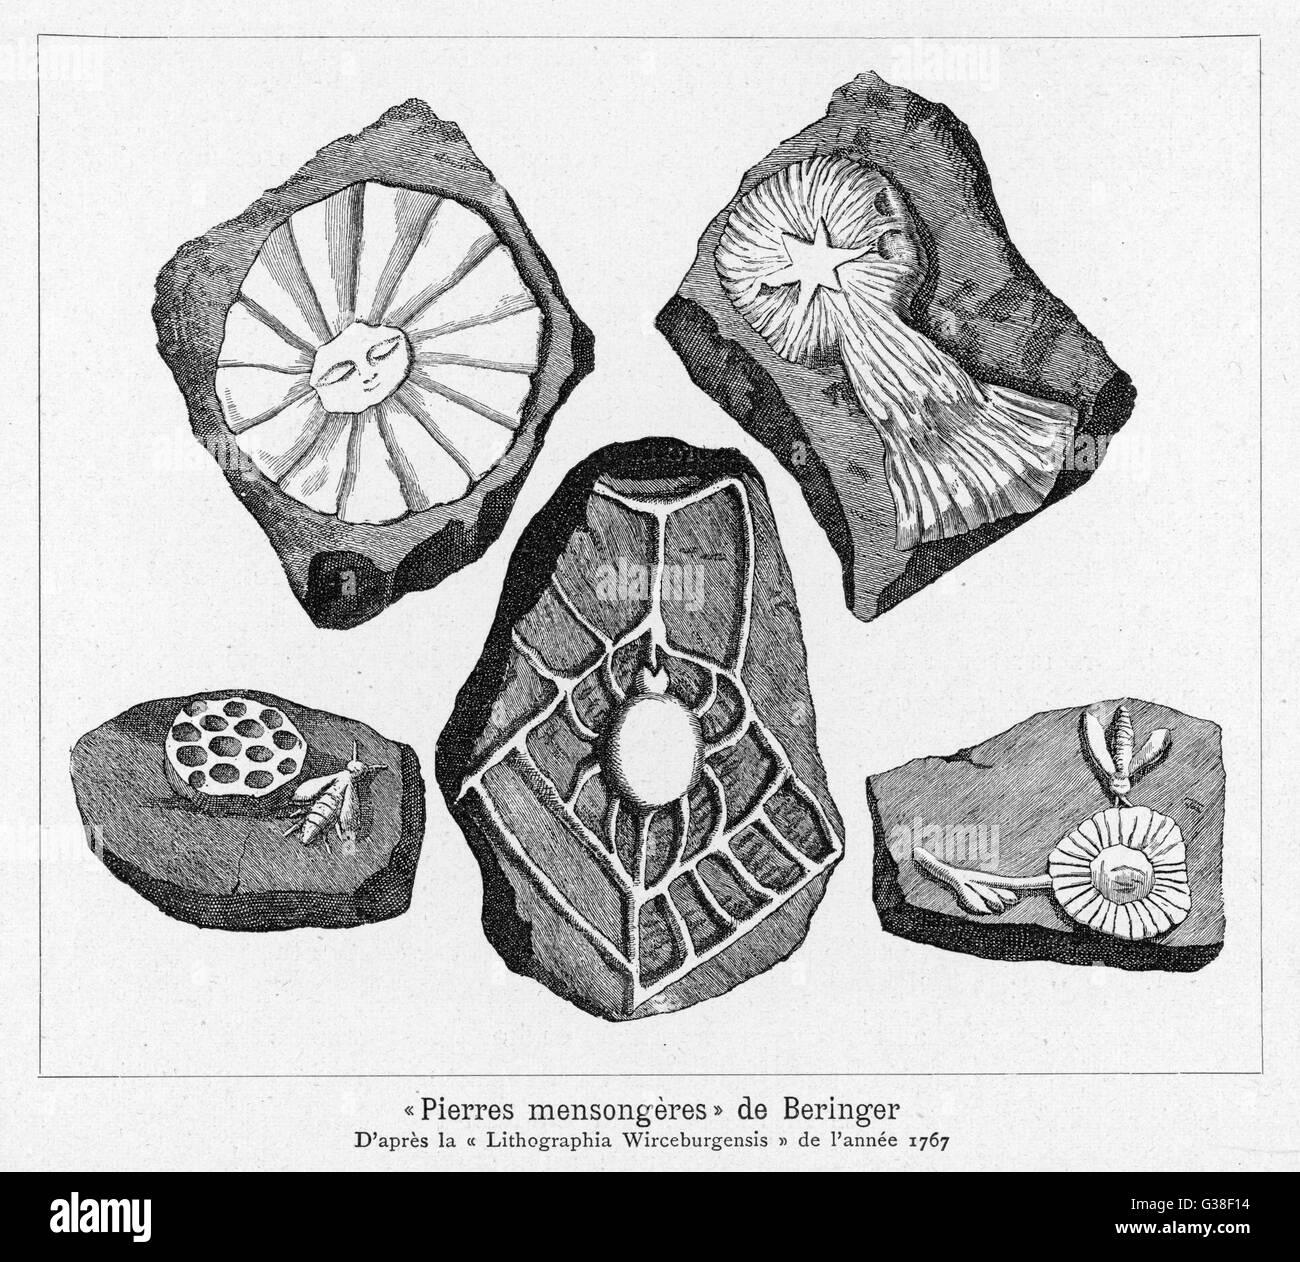 BERINGER'S LYING STONES Beringer (d.1740) a scholar of  Wurzburg, was taken in by stones apparently bearing - Stock Image